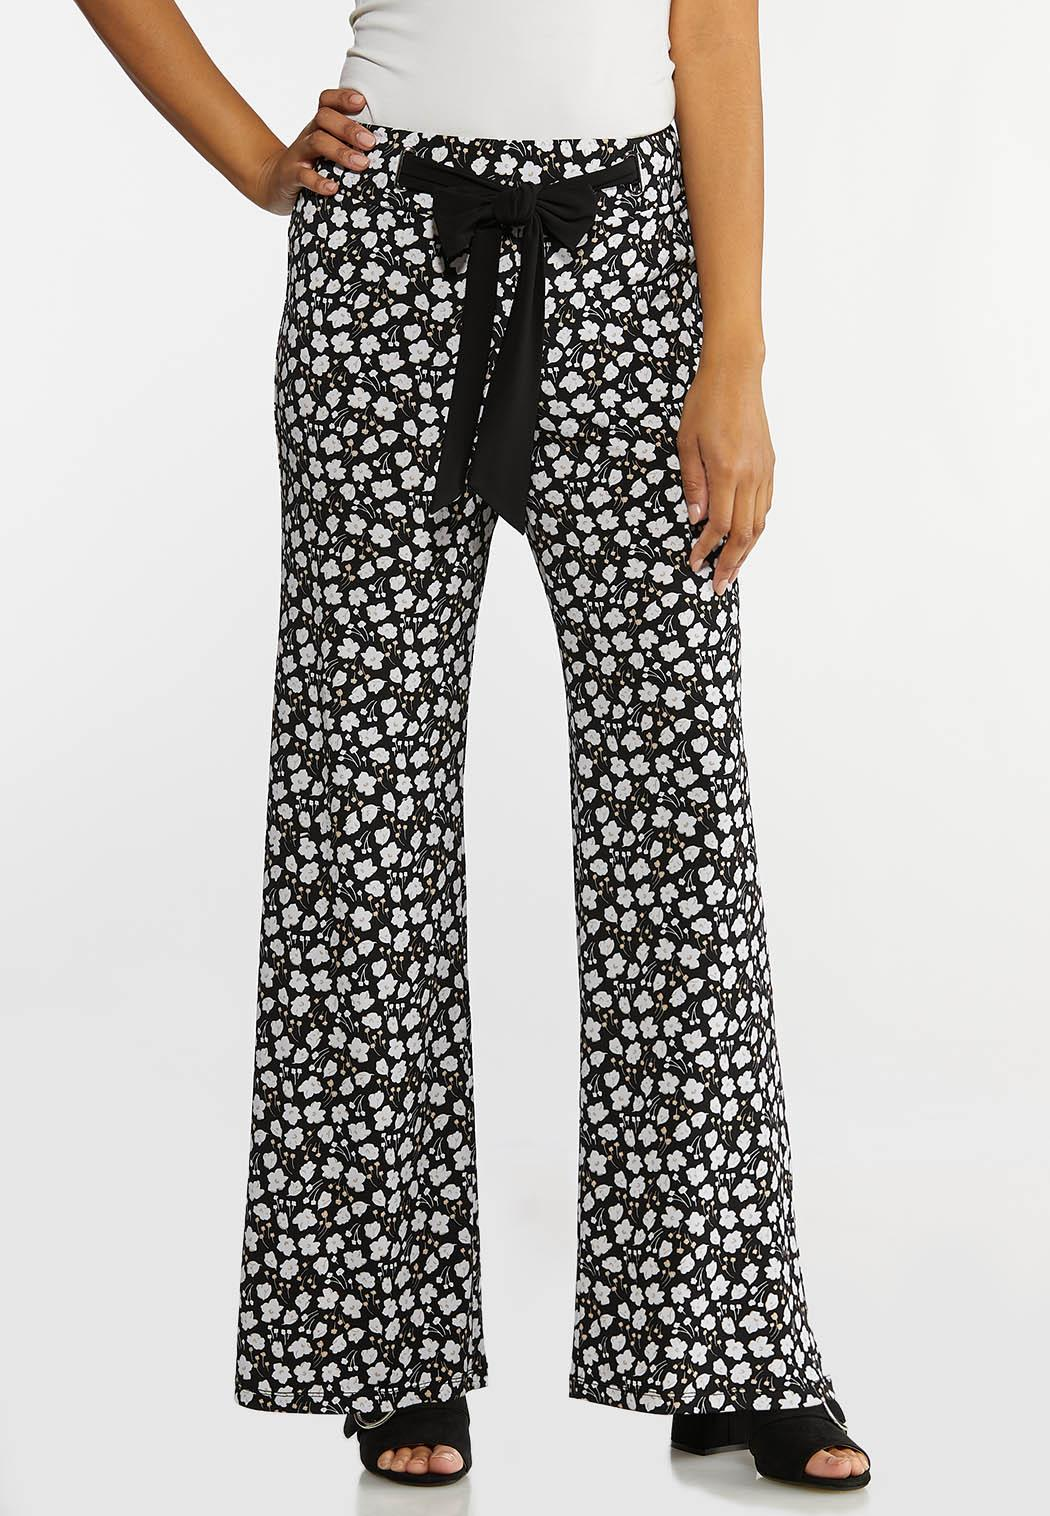 Petite Bitty Floral Tie Waist Pants